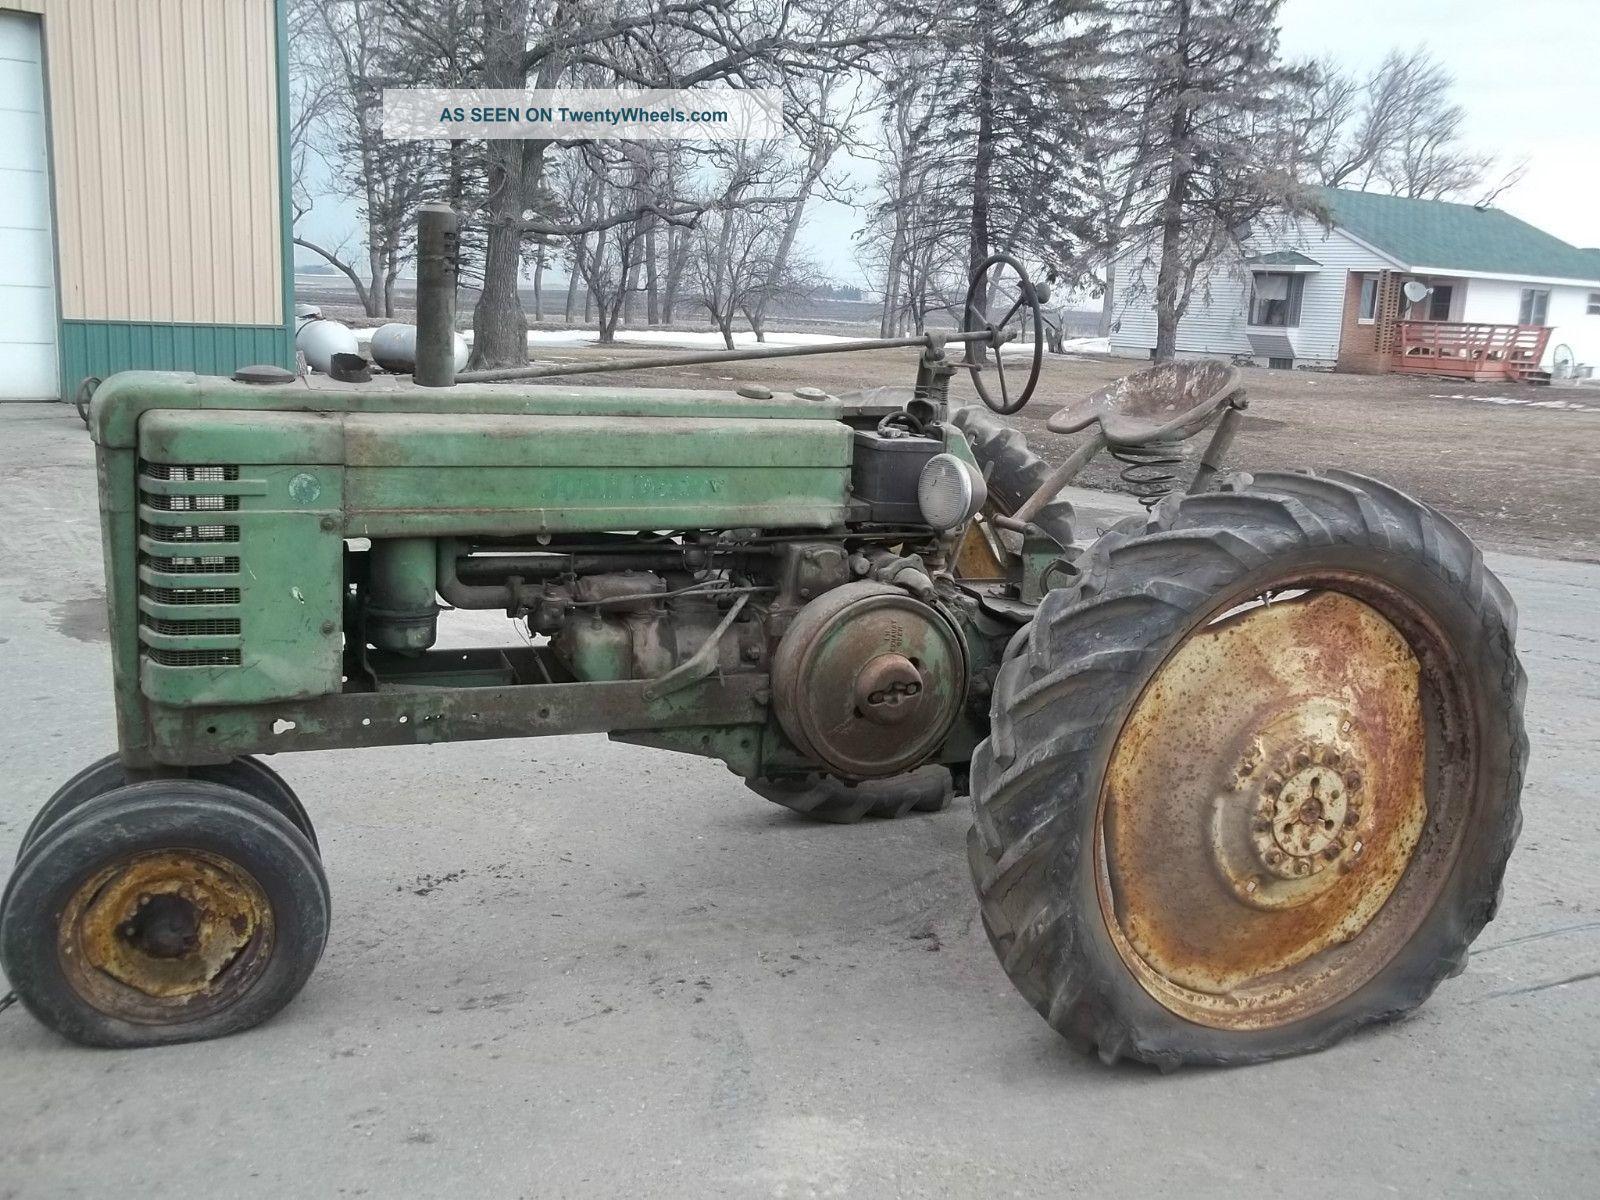 Rare John Deere Tractors : John deere b slant dash tractor very rare push button